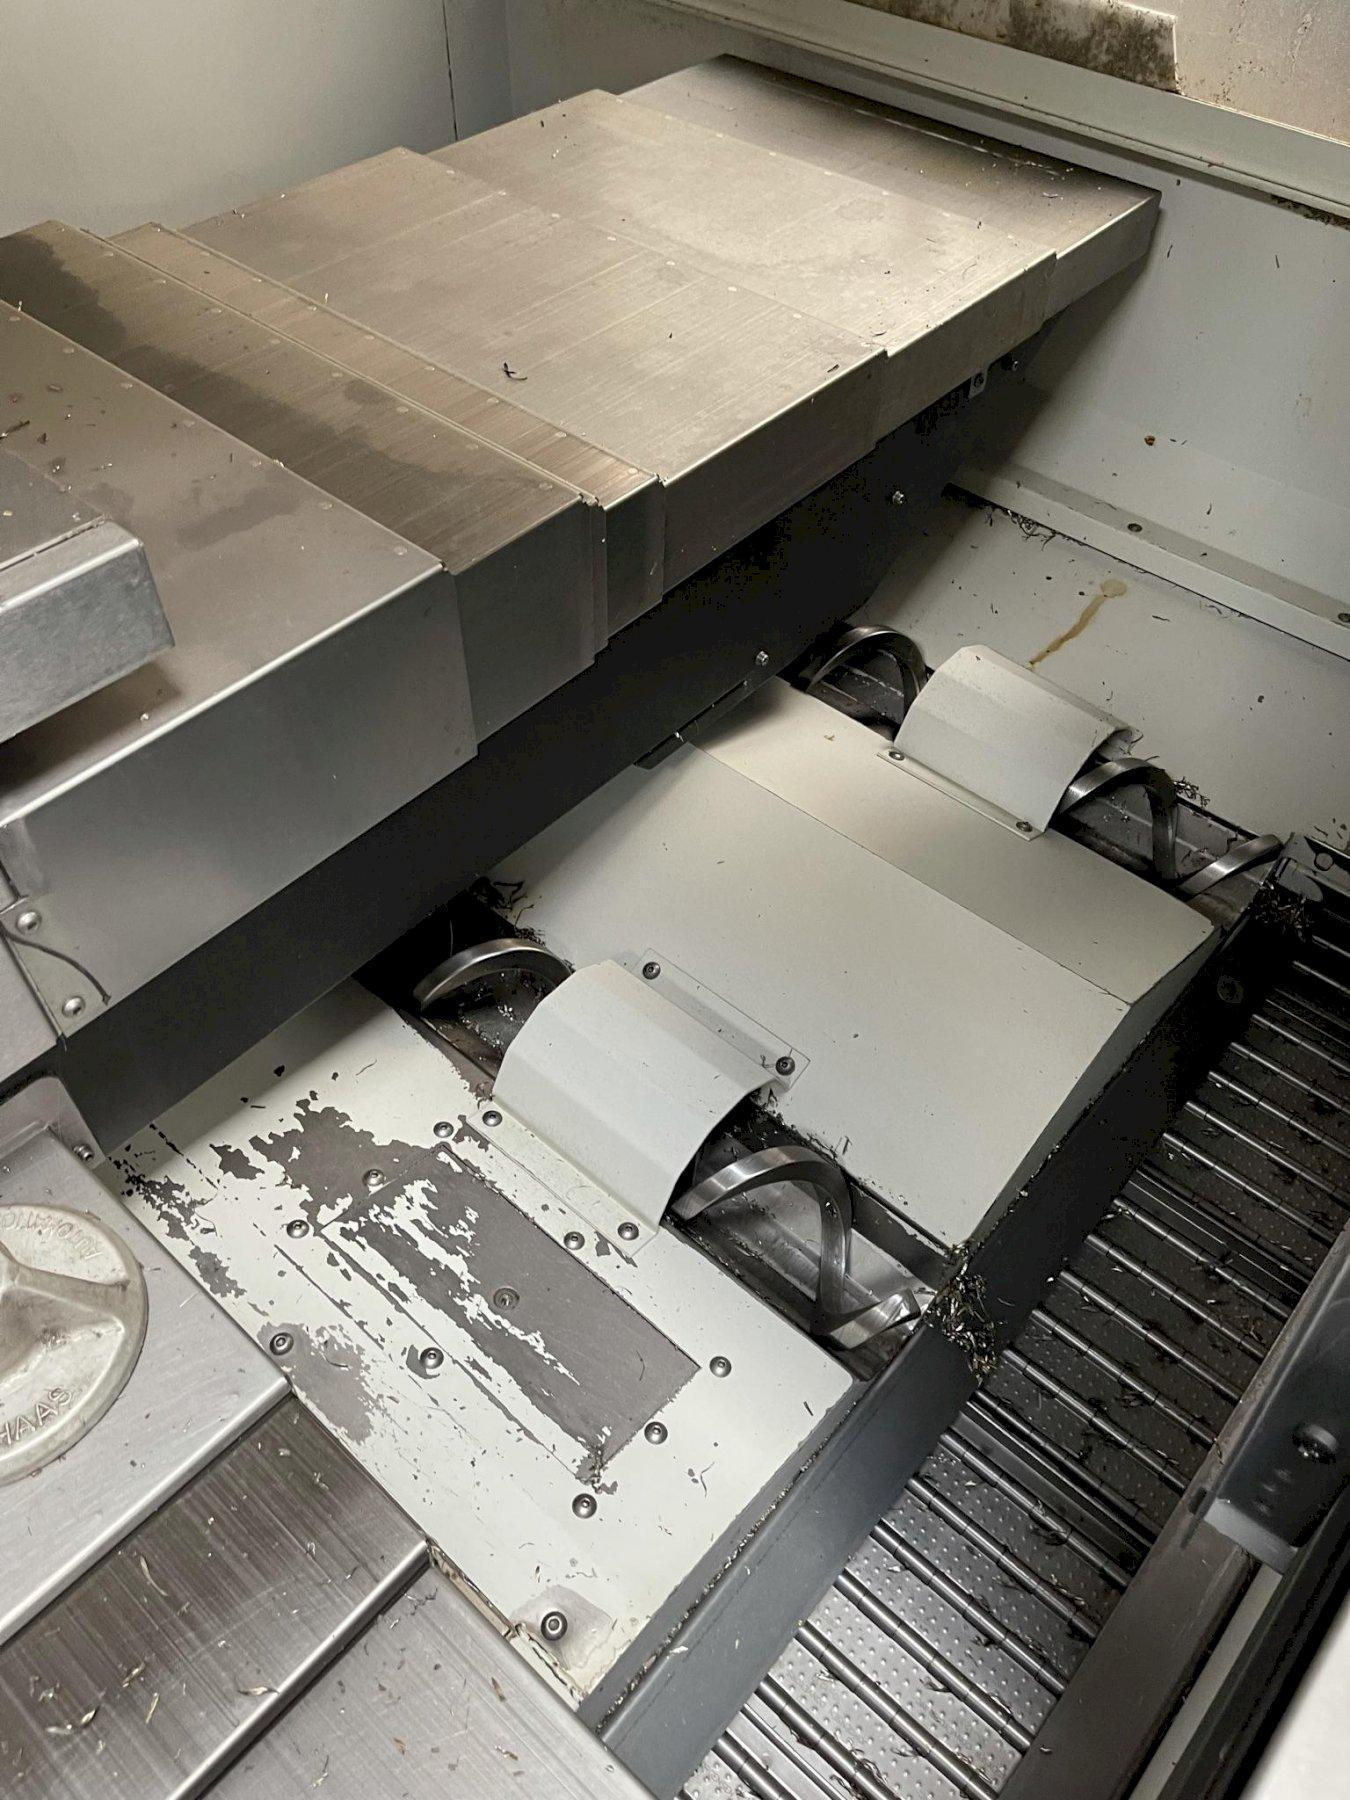 HAAS2014 Haas VF-4 Vertical Machining Center